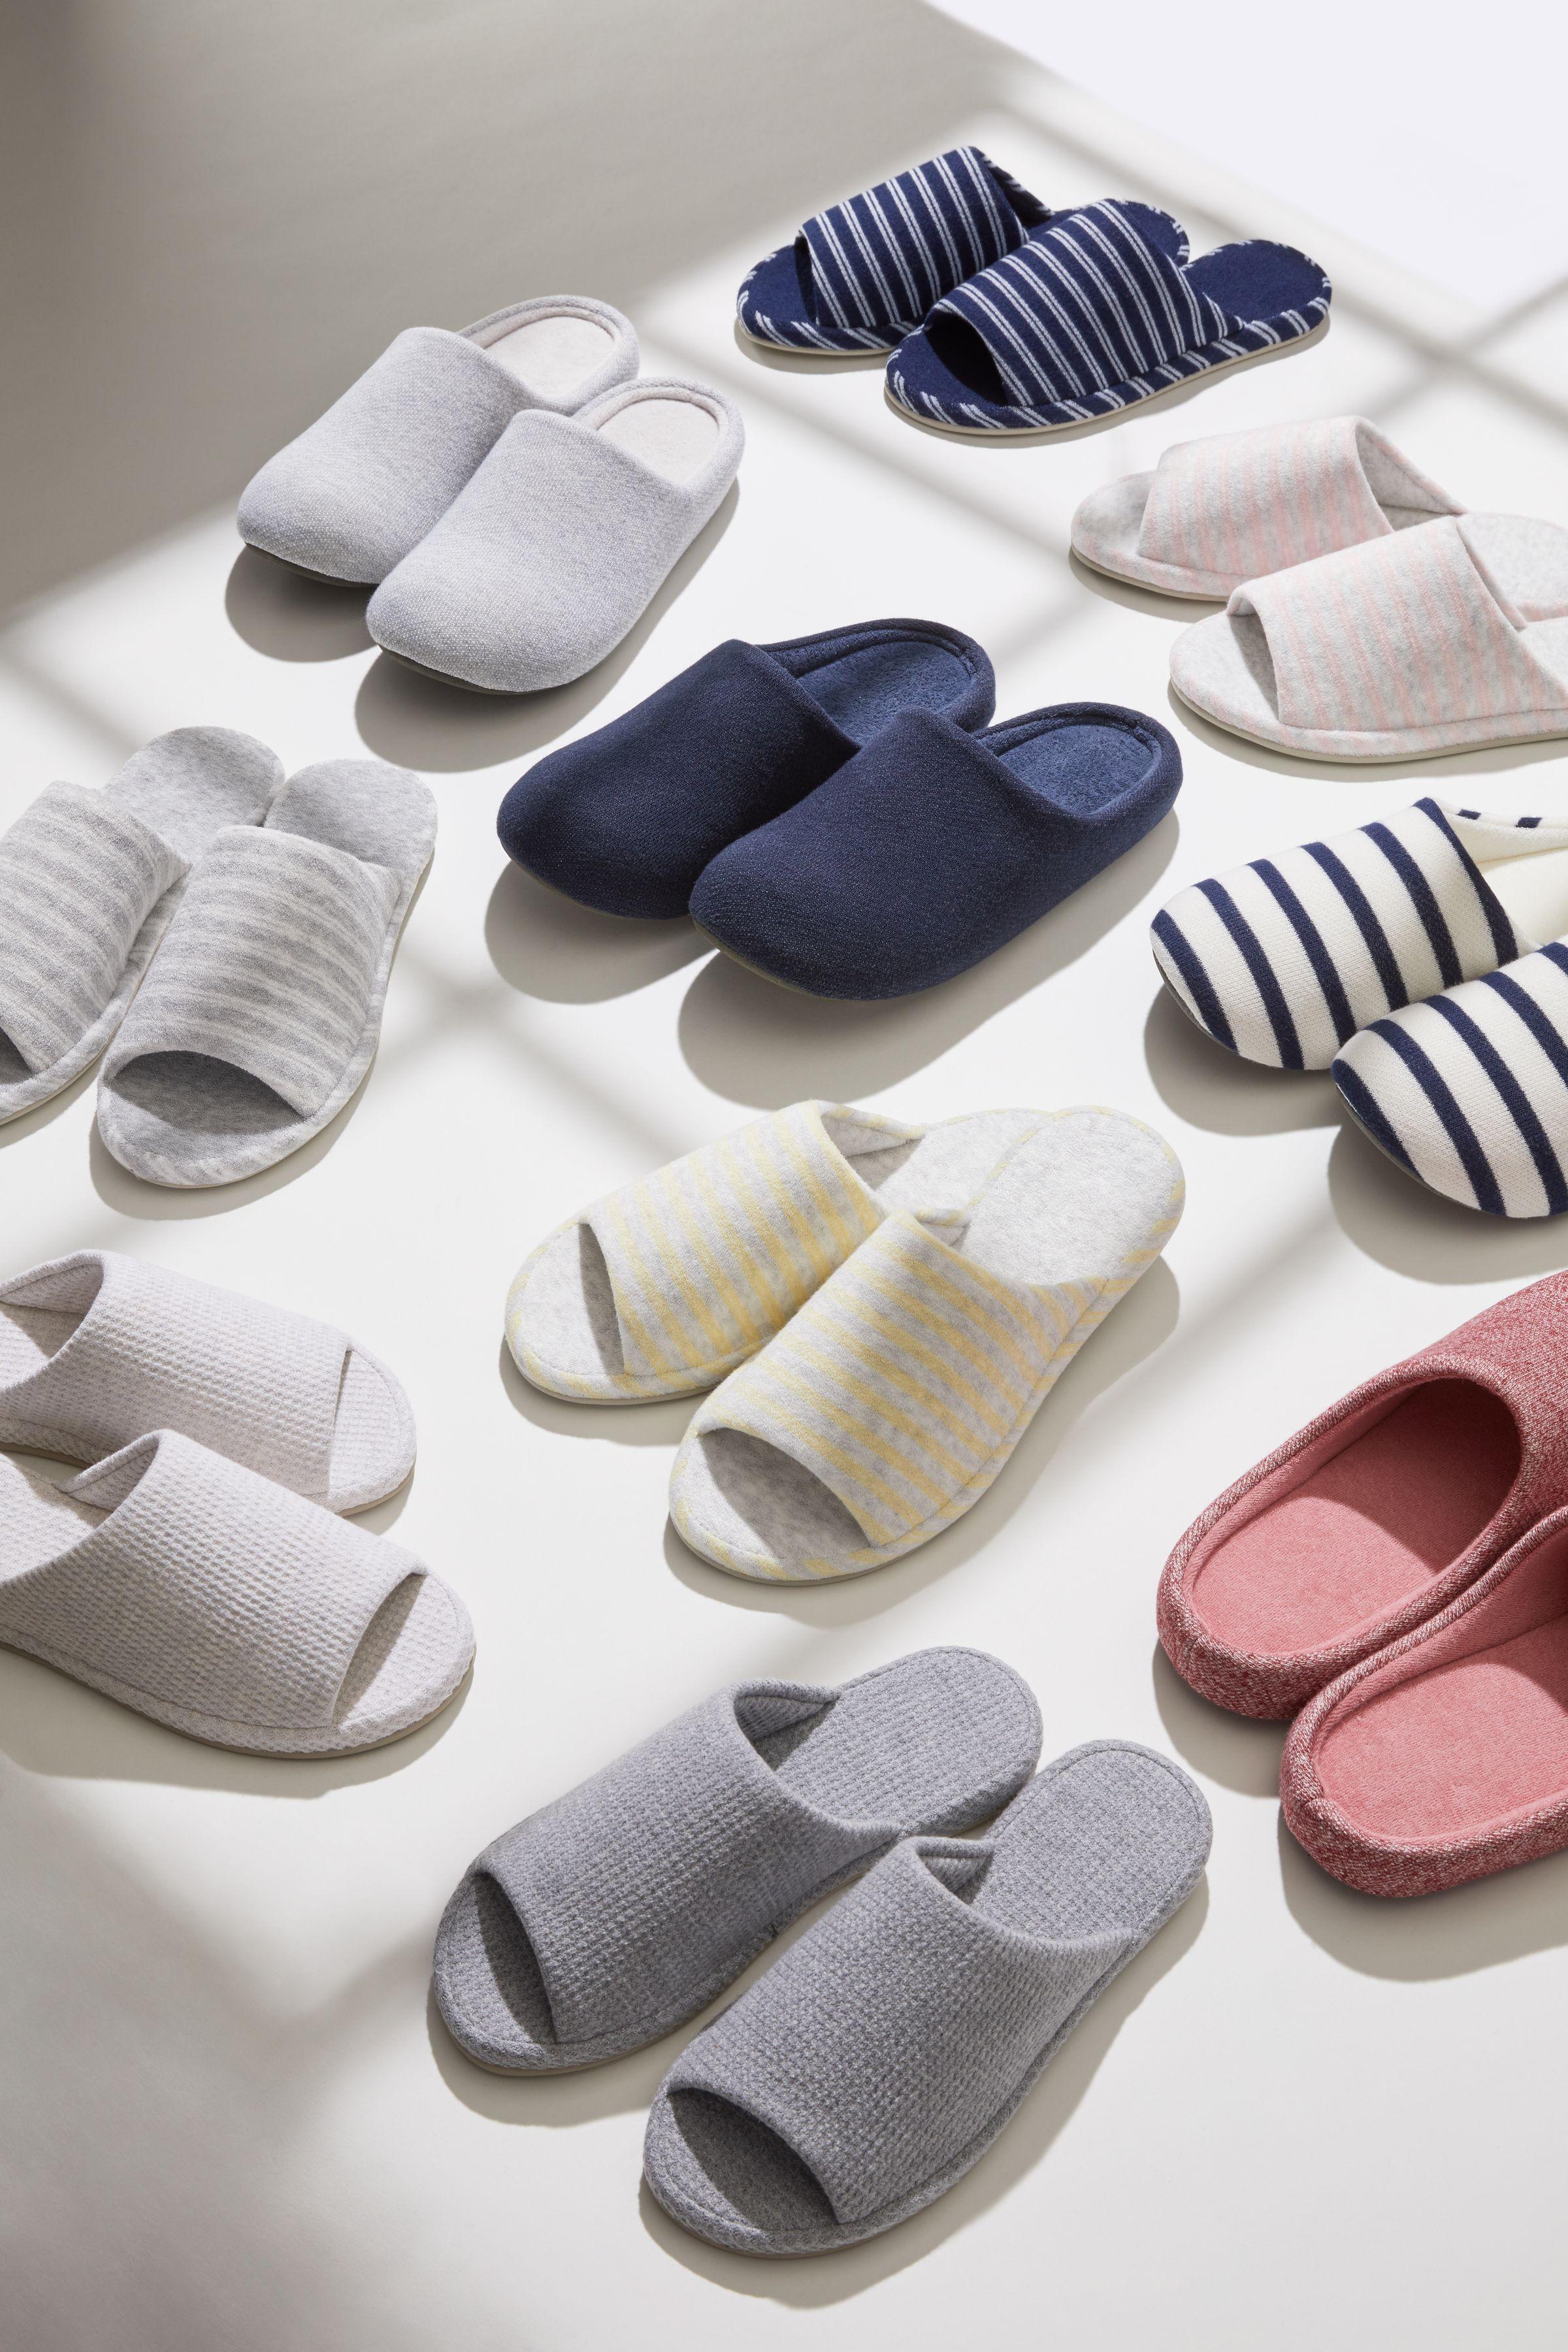 Uniqlo laydown still life art direction slippers